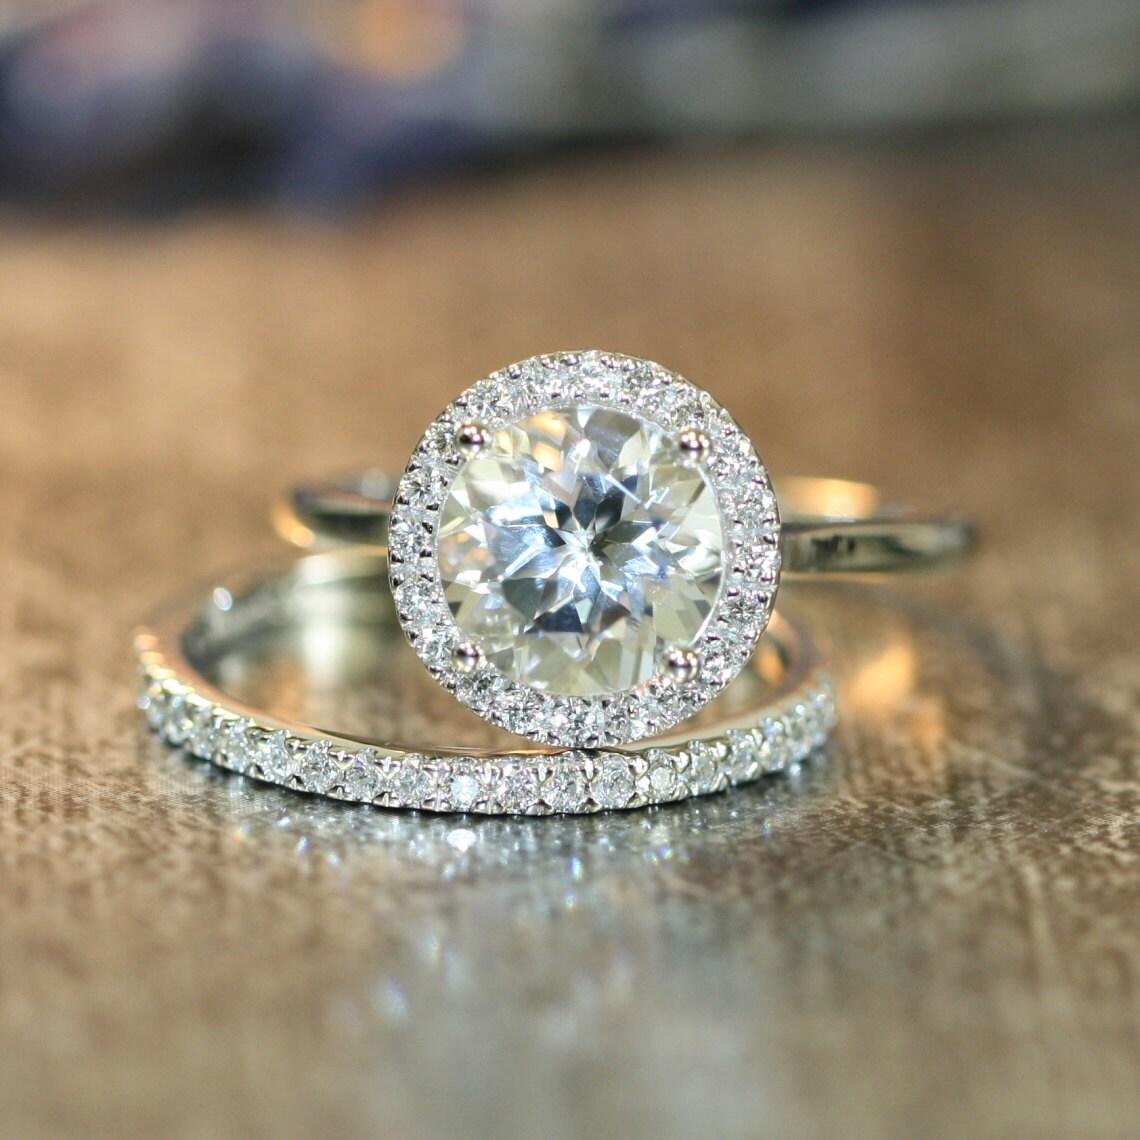 halo diamond white topaz engagement wedding ring by. Black Bedroom Furniture Sets. Home Design Ideas